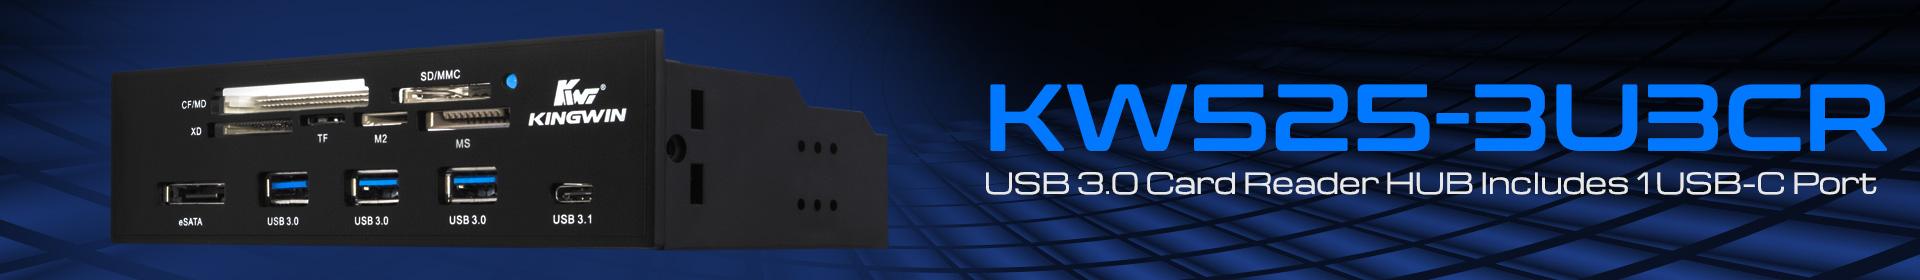 KW525-3U3CR_WEB_BANNER_FINAL